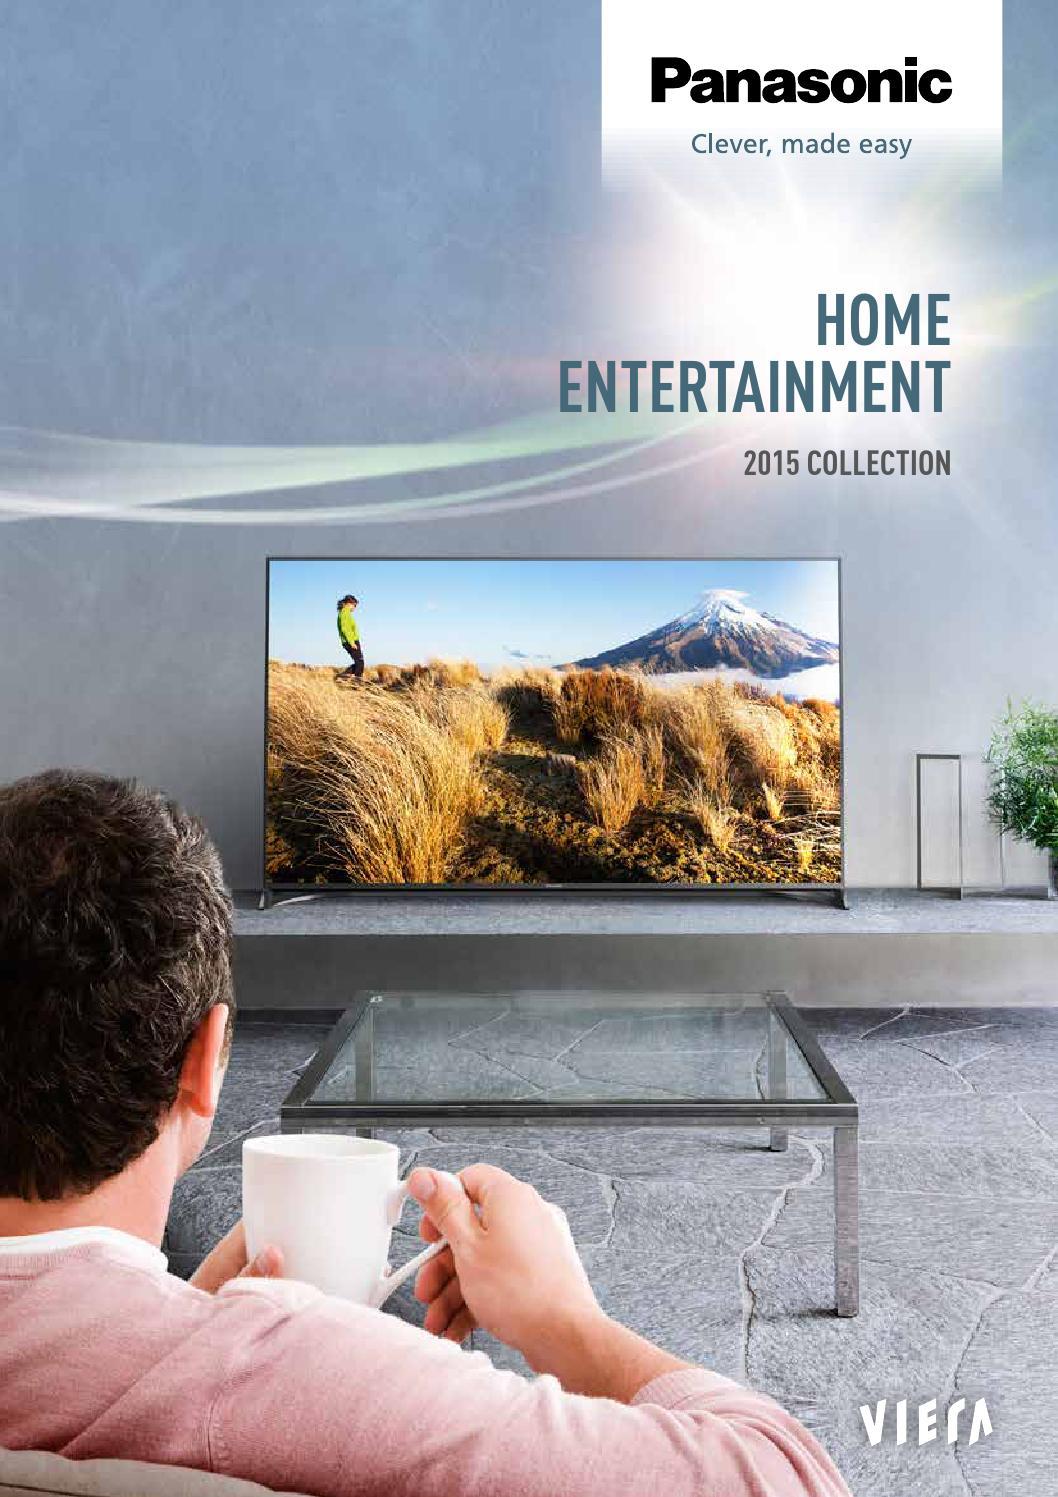 panasonic home entertainment brochure 2015 by panasonic nz issuu. Black Bedroom Furniture Sets. Home Design Ideas